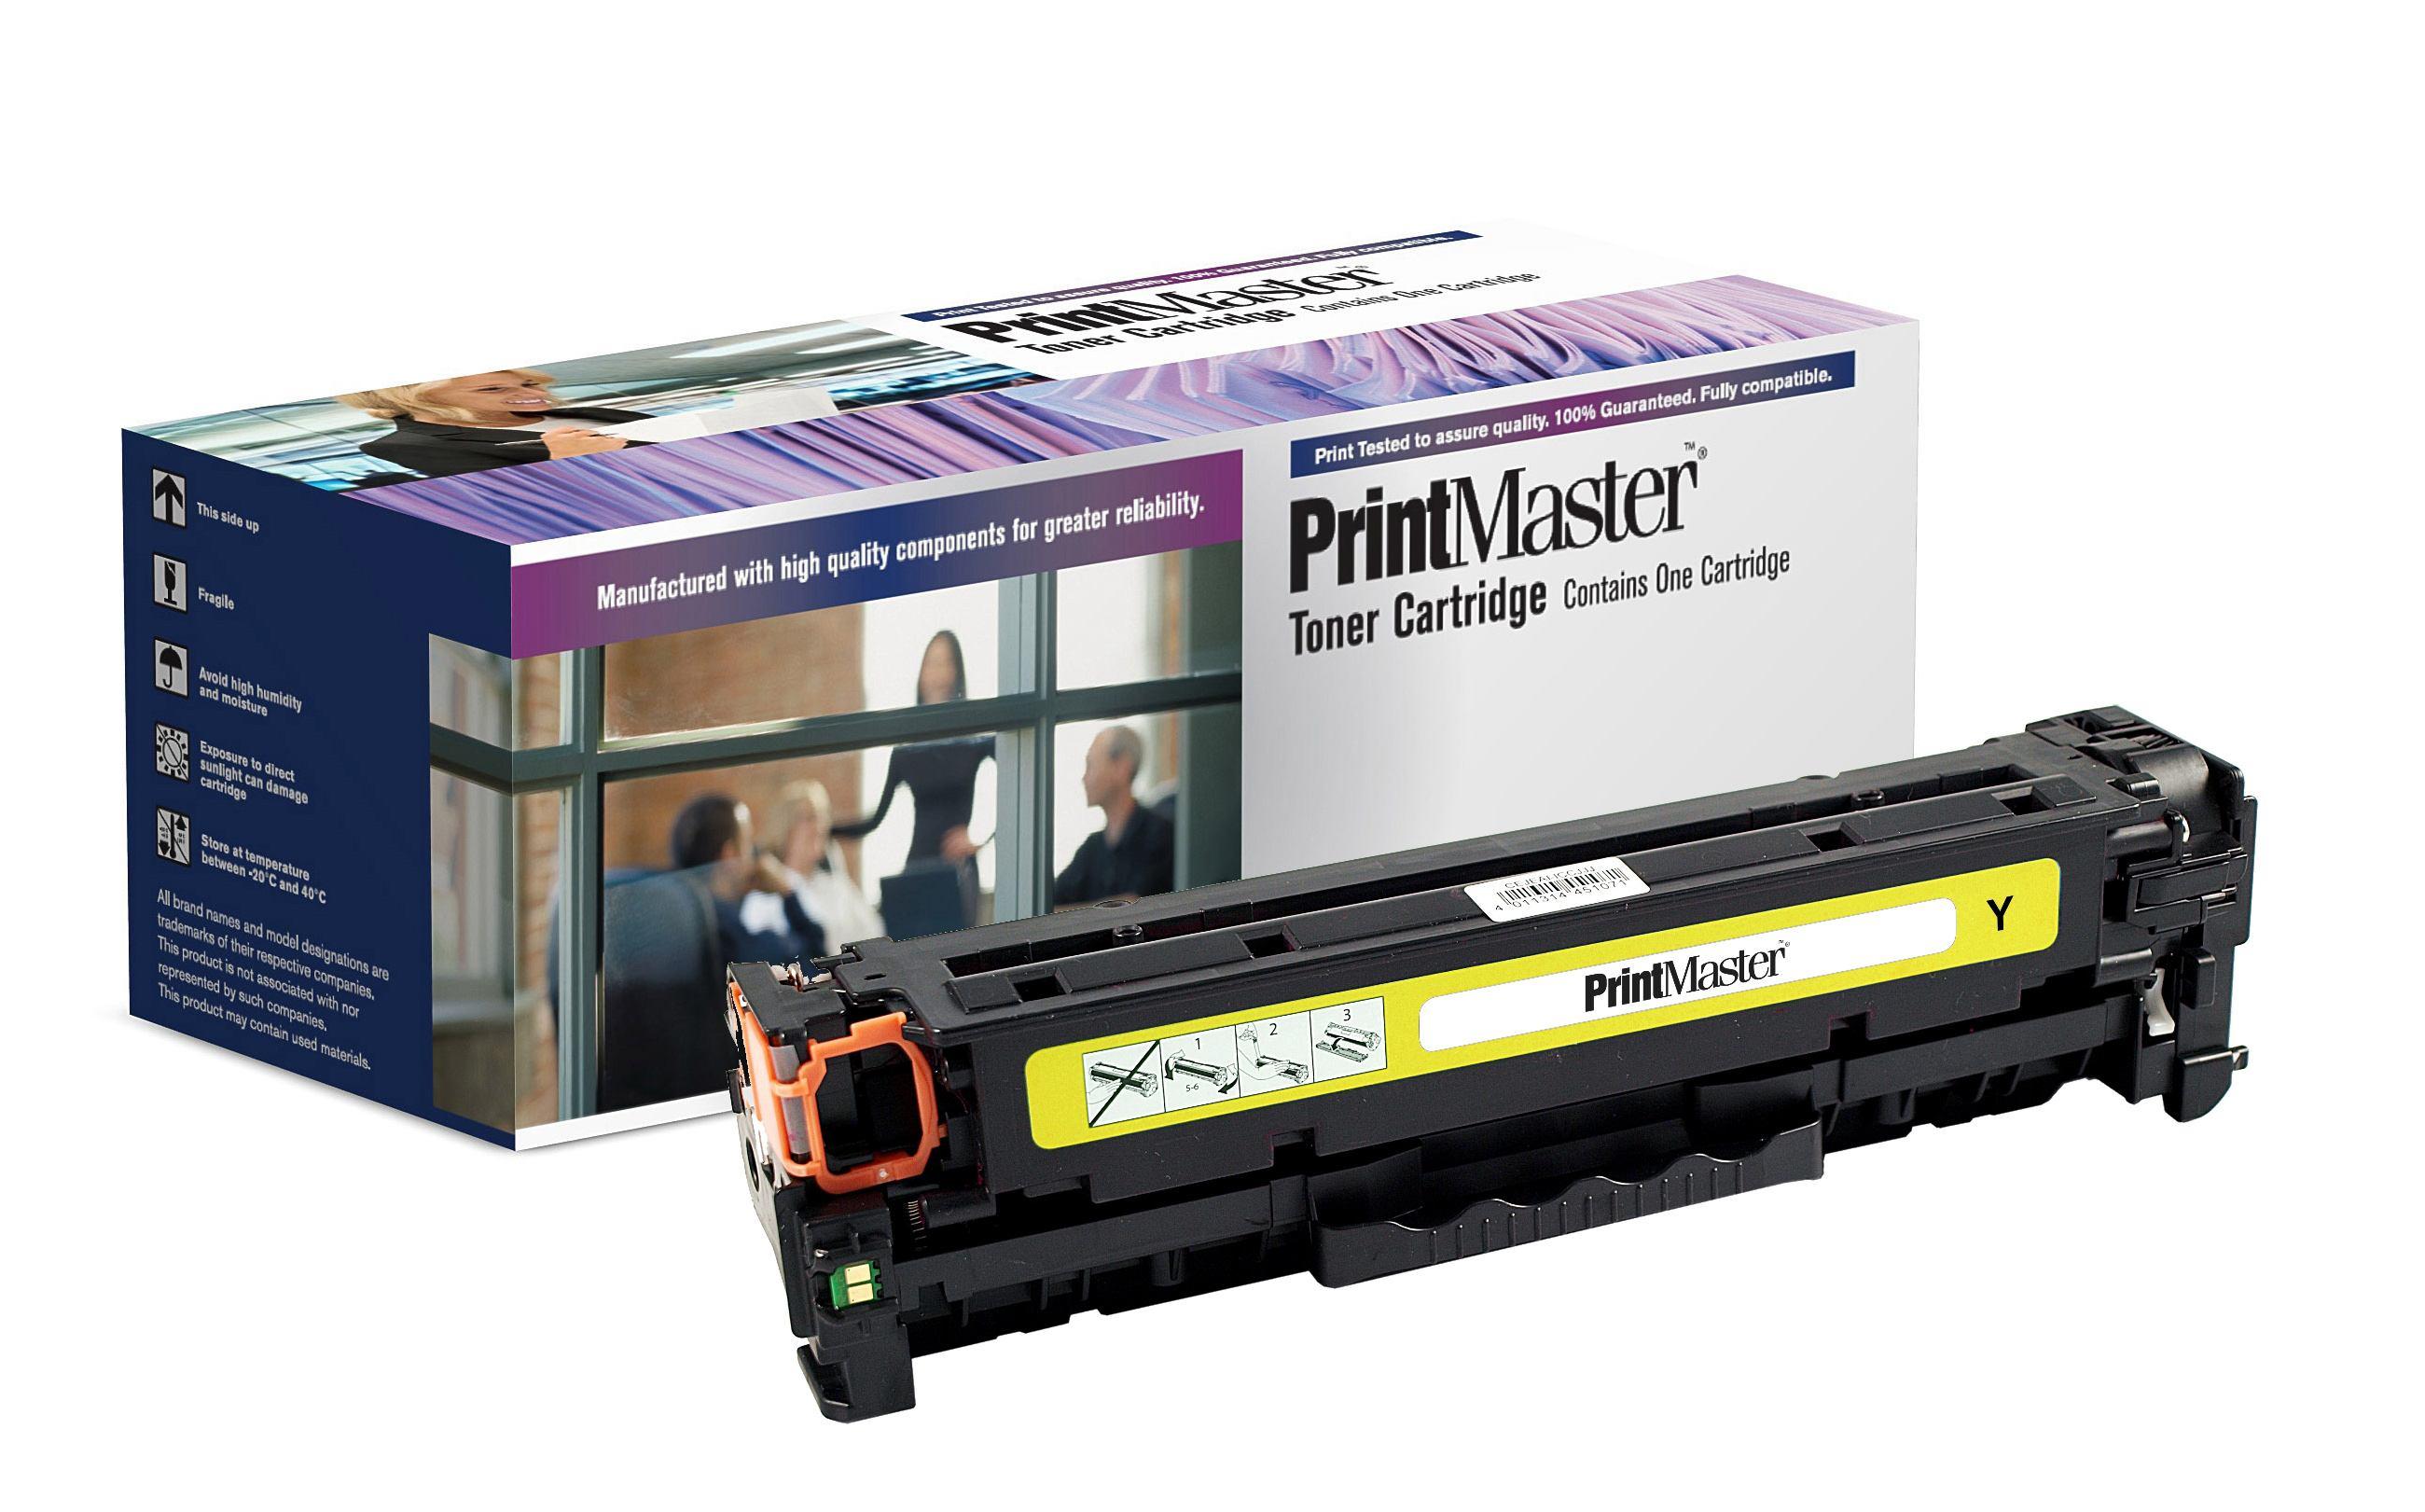 PrintMaster HP M251 Yellow Toner 1.8K